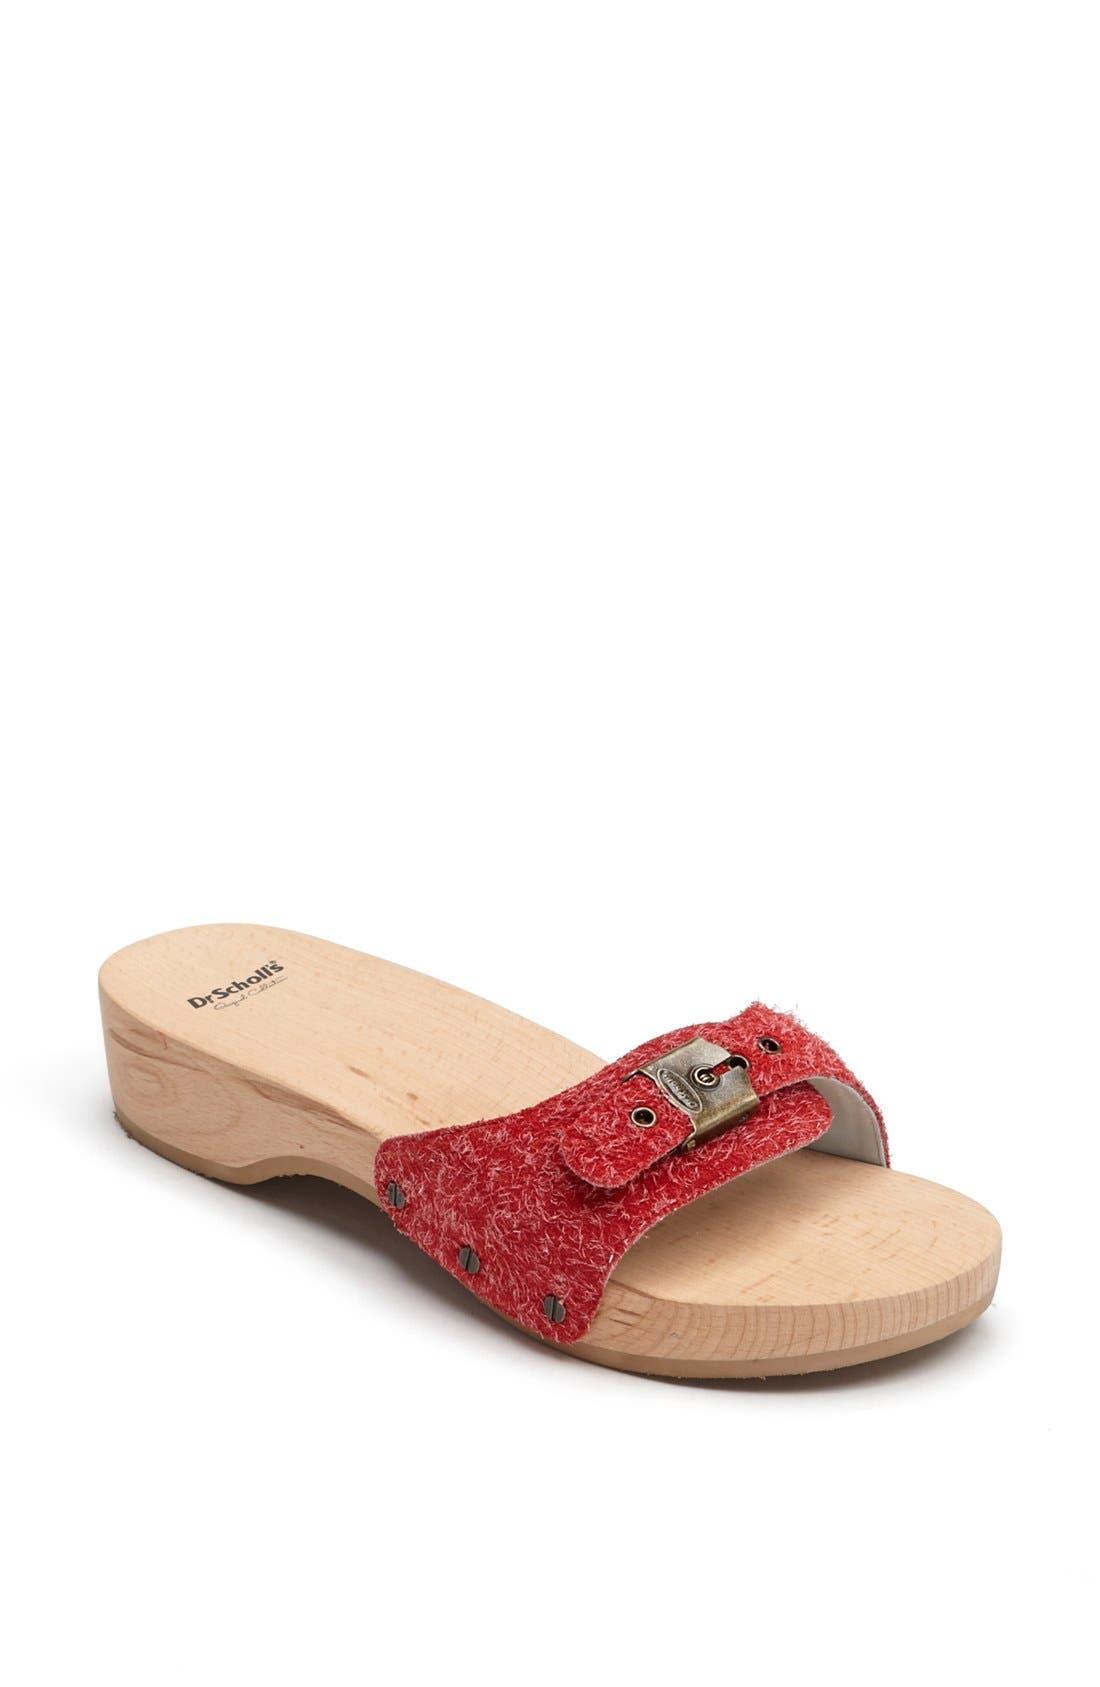 Main Image - Dr. Scholl's Original Collection Sandal